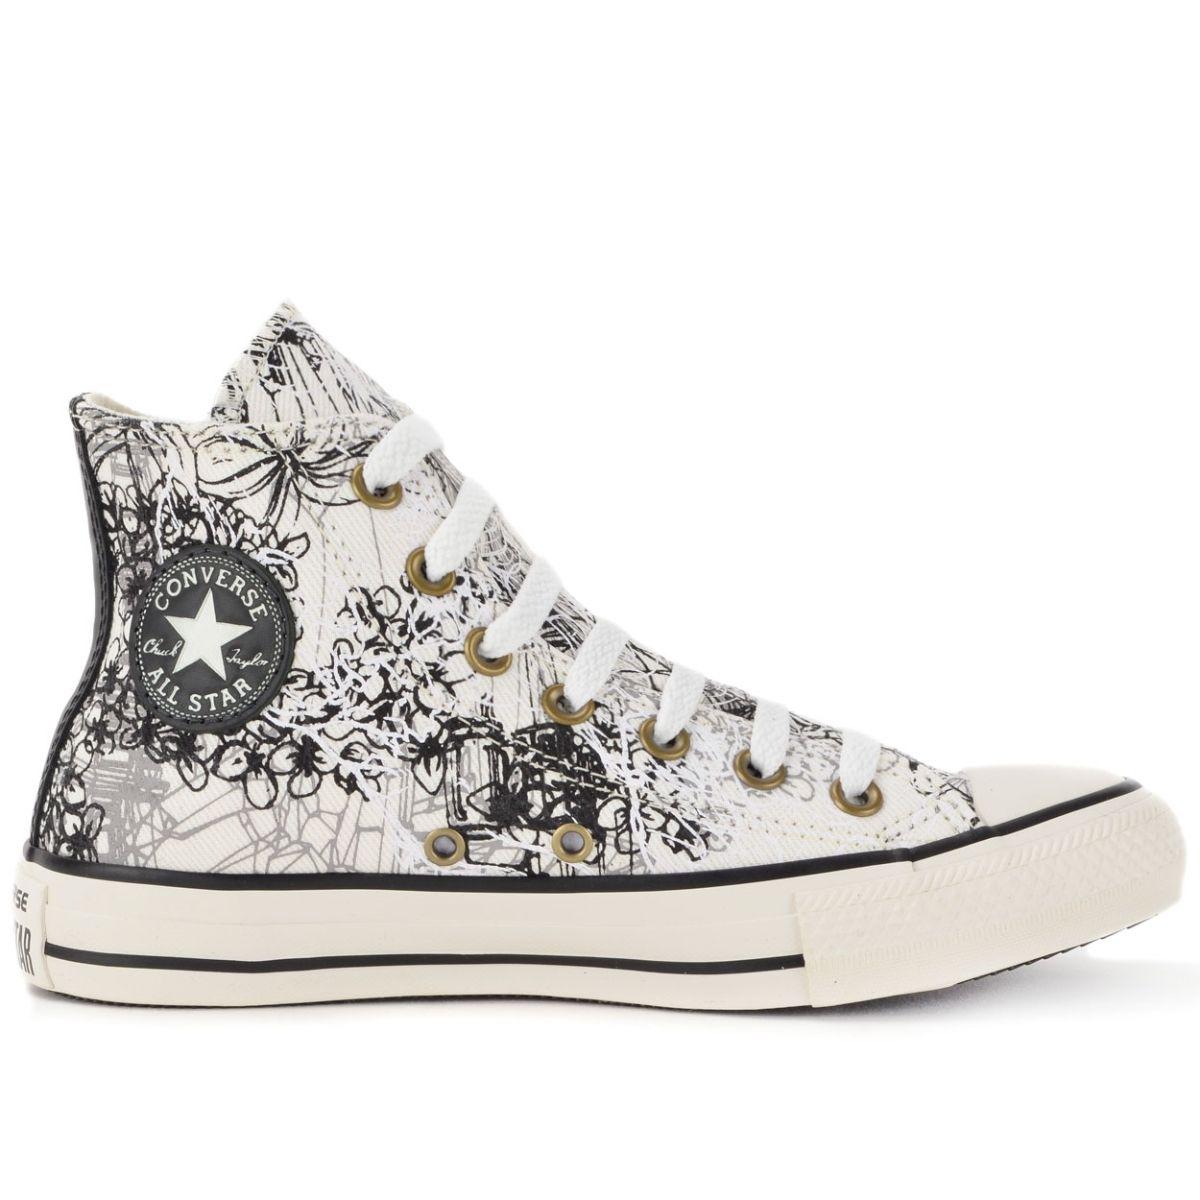 52e0db831b1 Tênis Converse All Star CT As Hi Amendoa Preto CT03000001